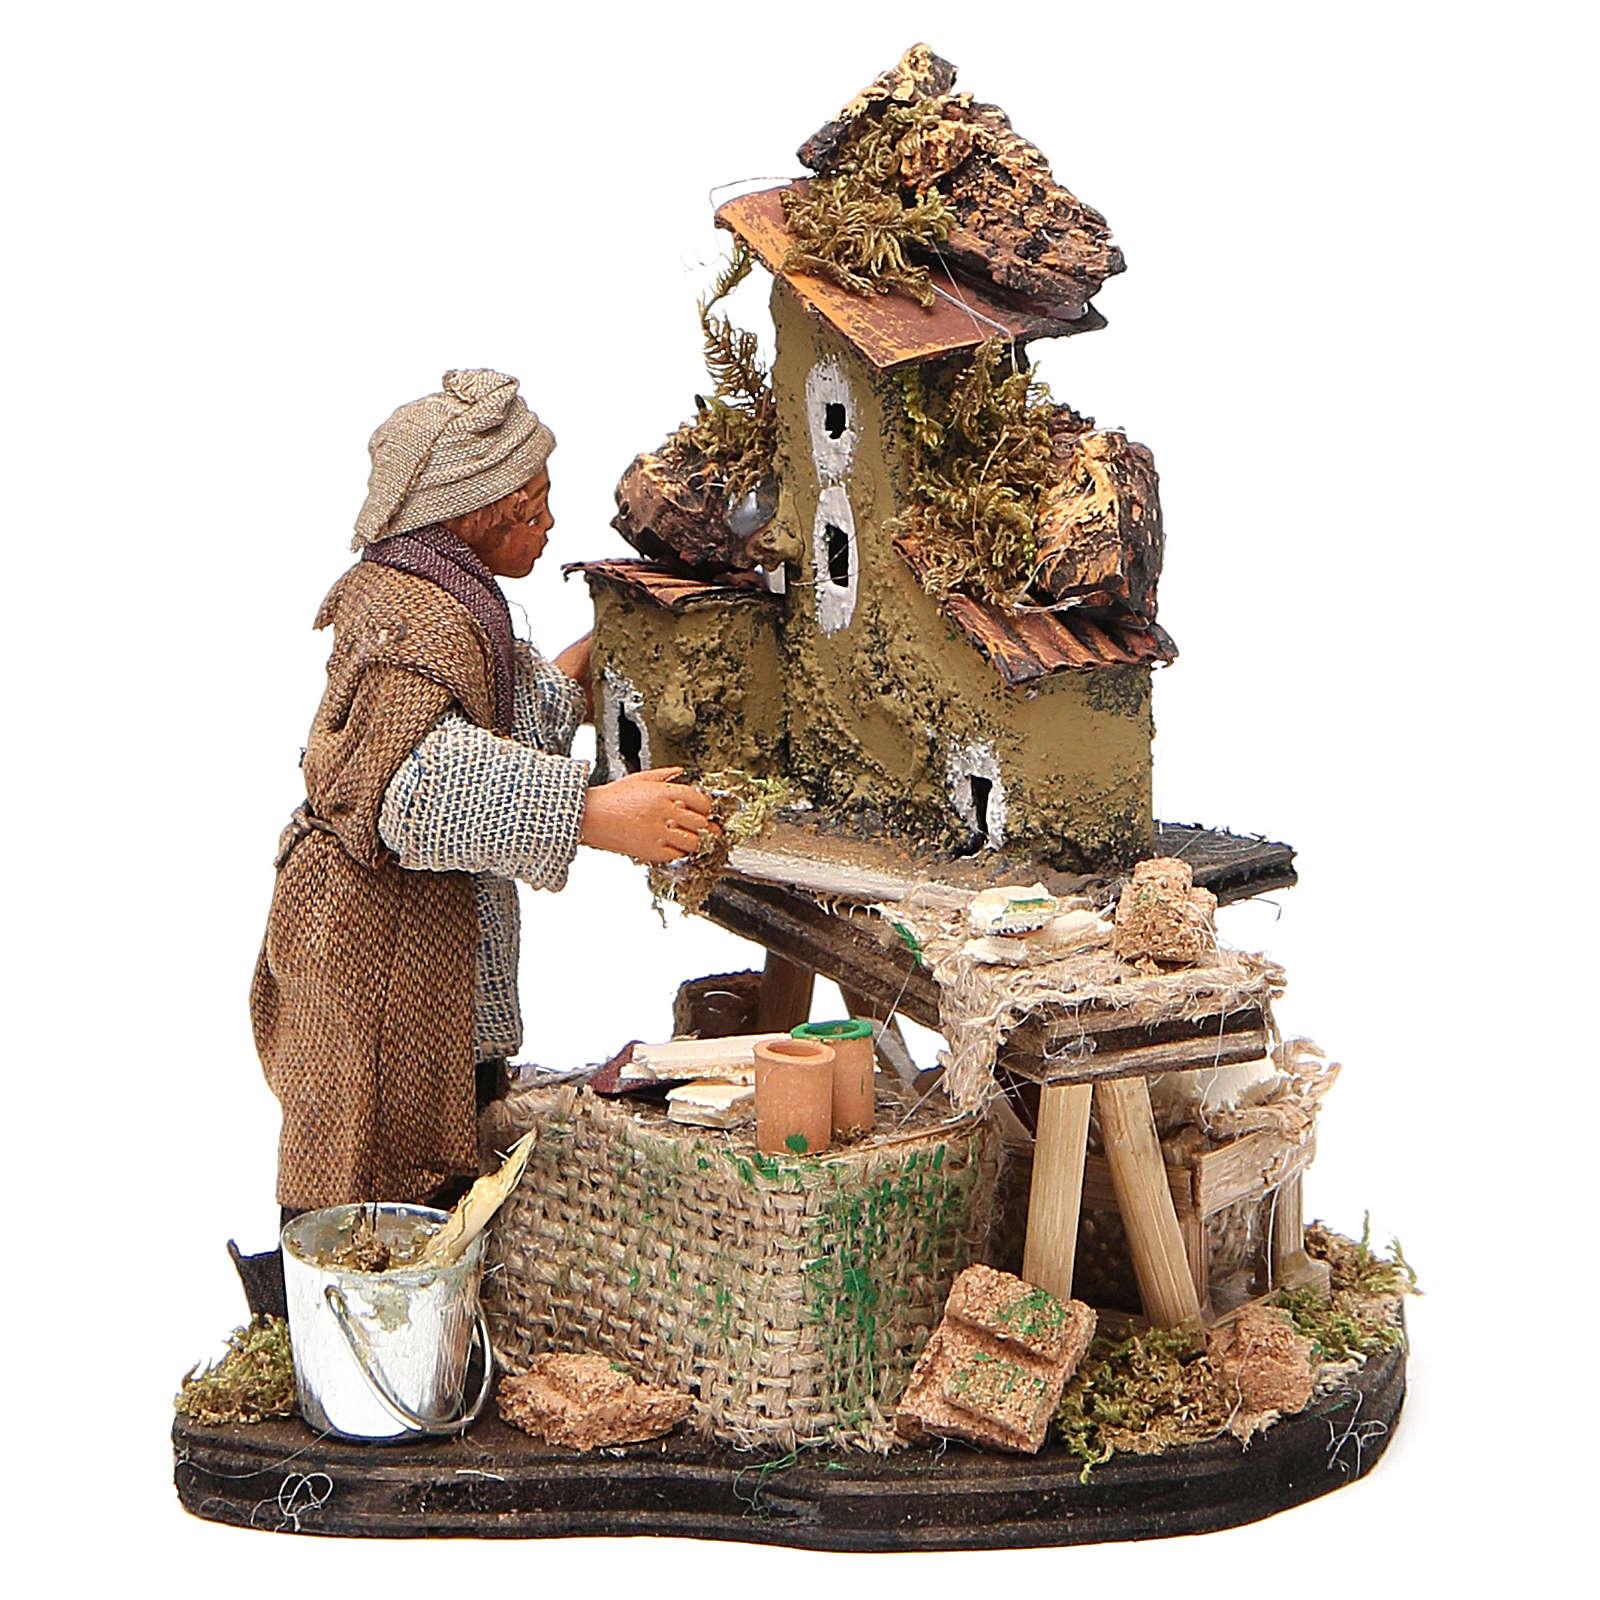 Nativity scene artist, Neapolitan nativity figurine 10cm 4